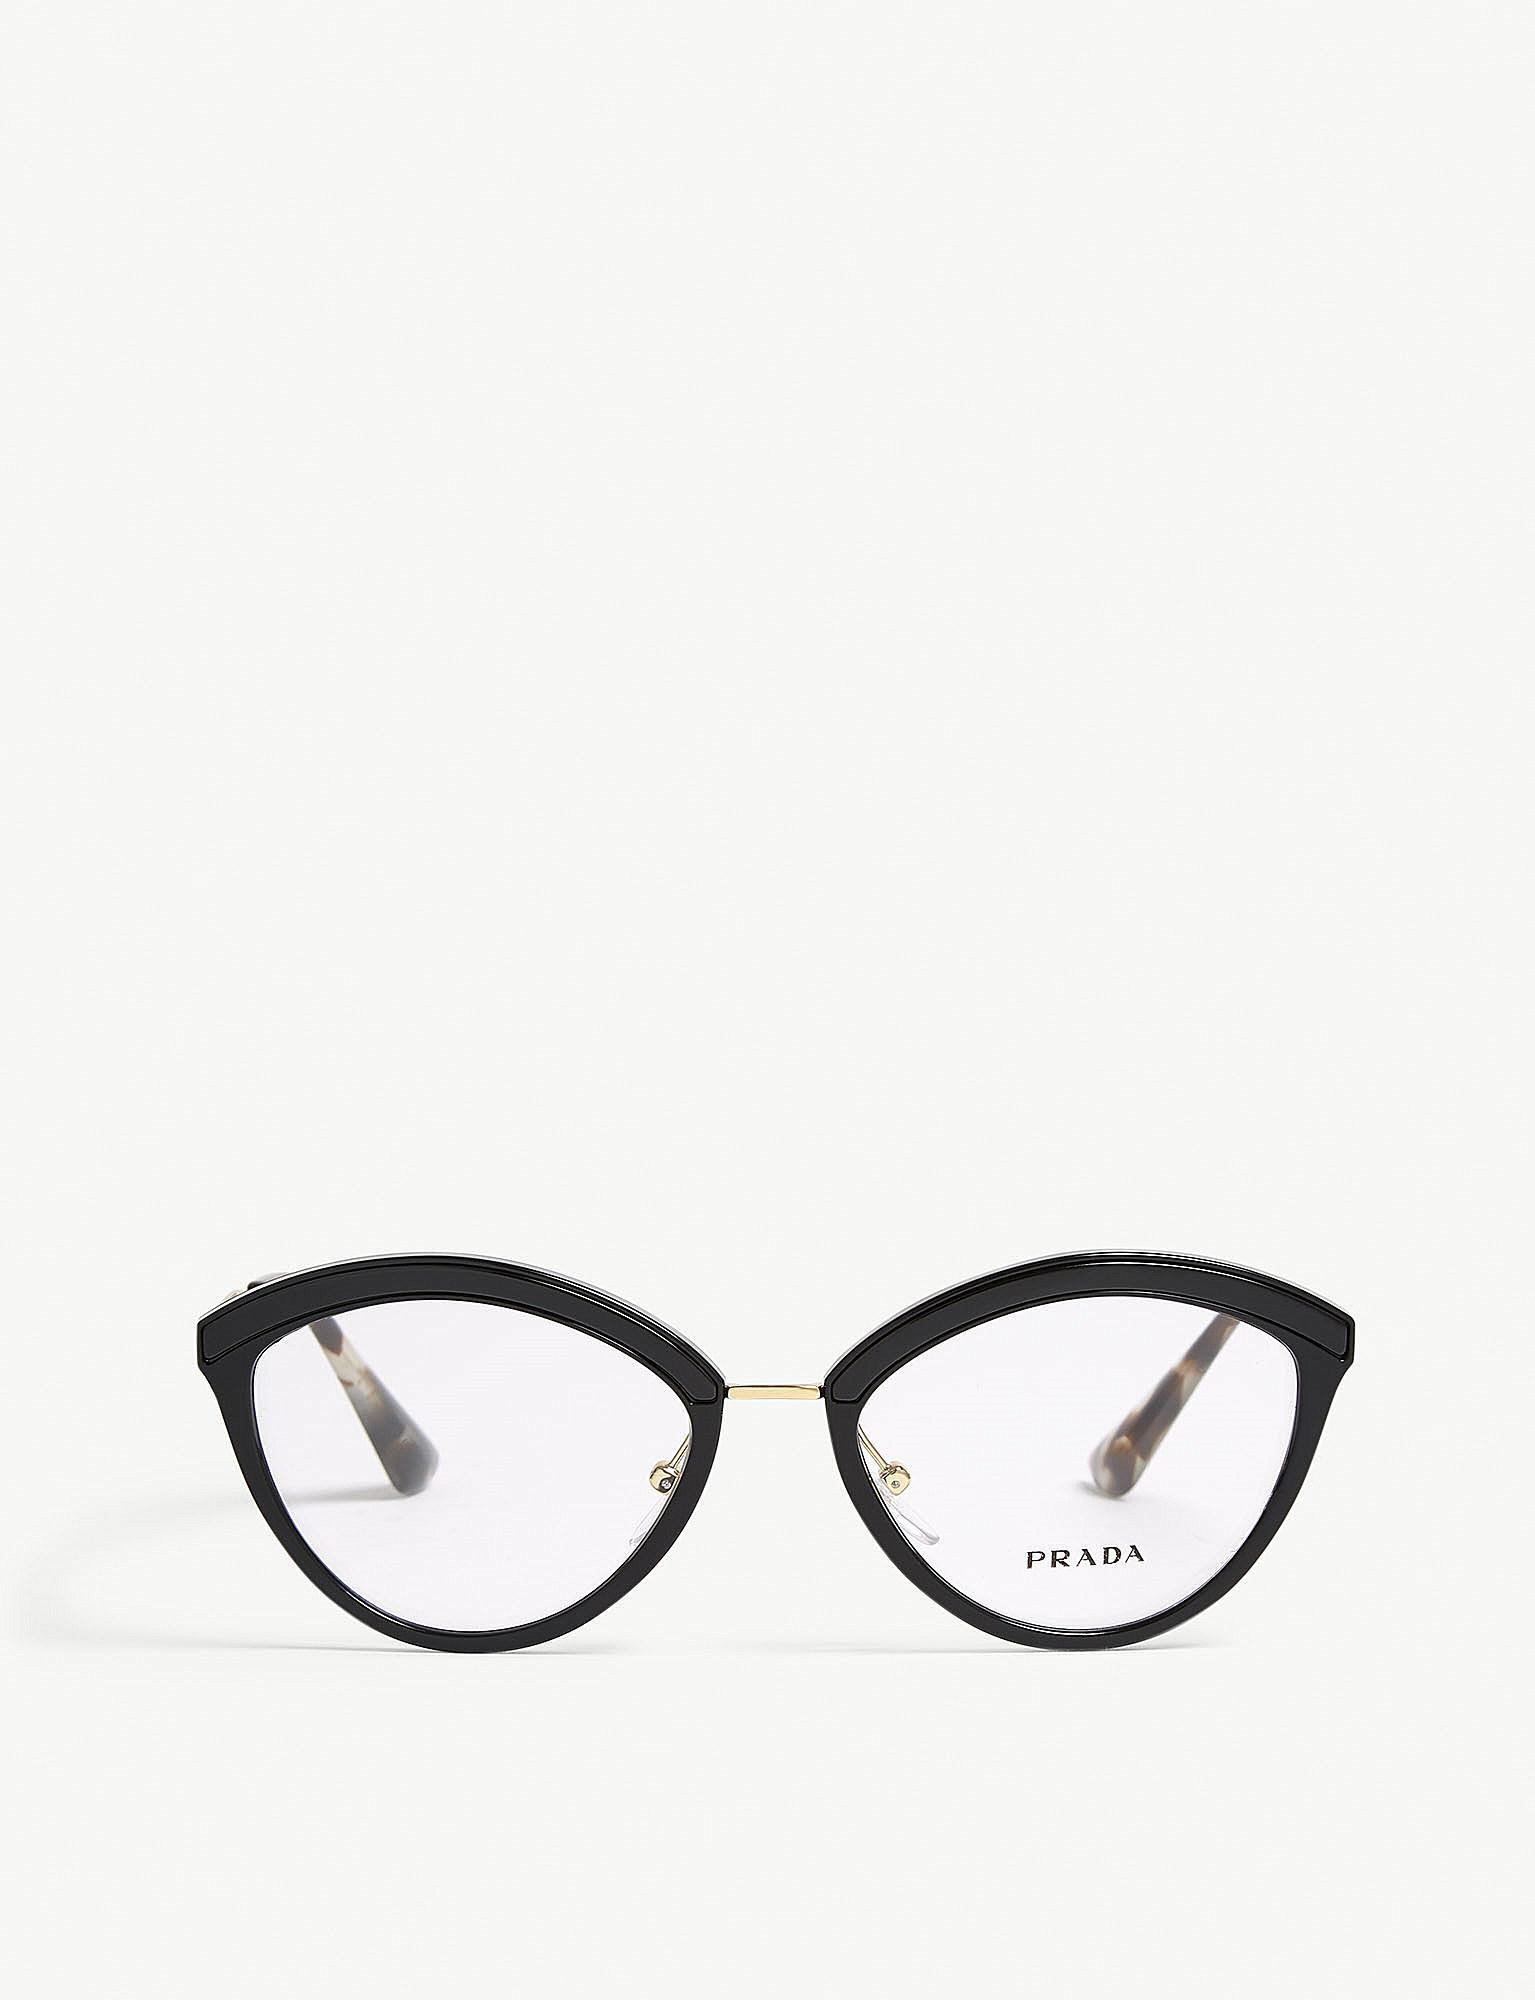 2f21a2bea98 Lyst - Prada Womens Black Pr14uv Oval-frame Glasses in Black